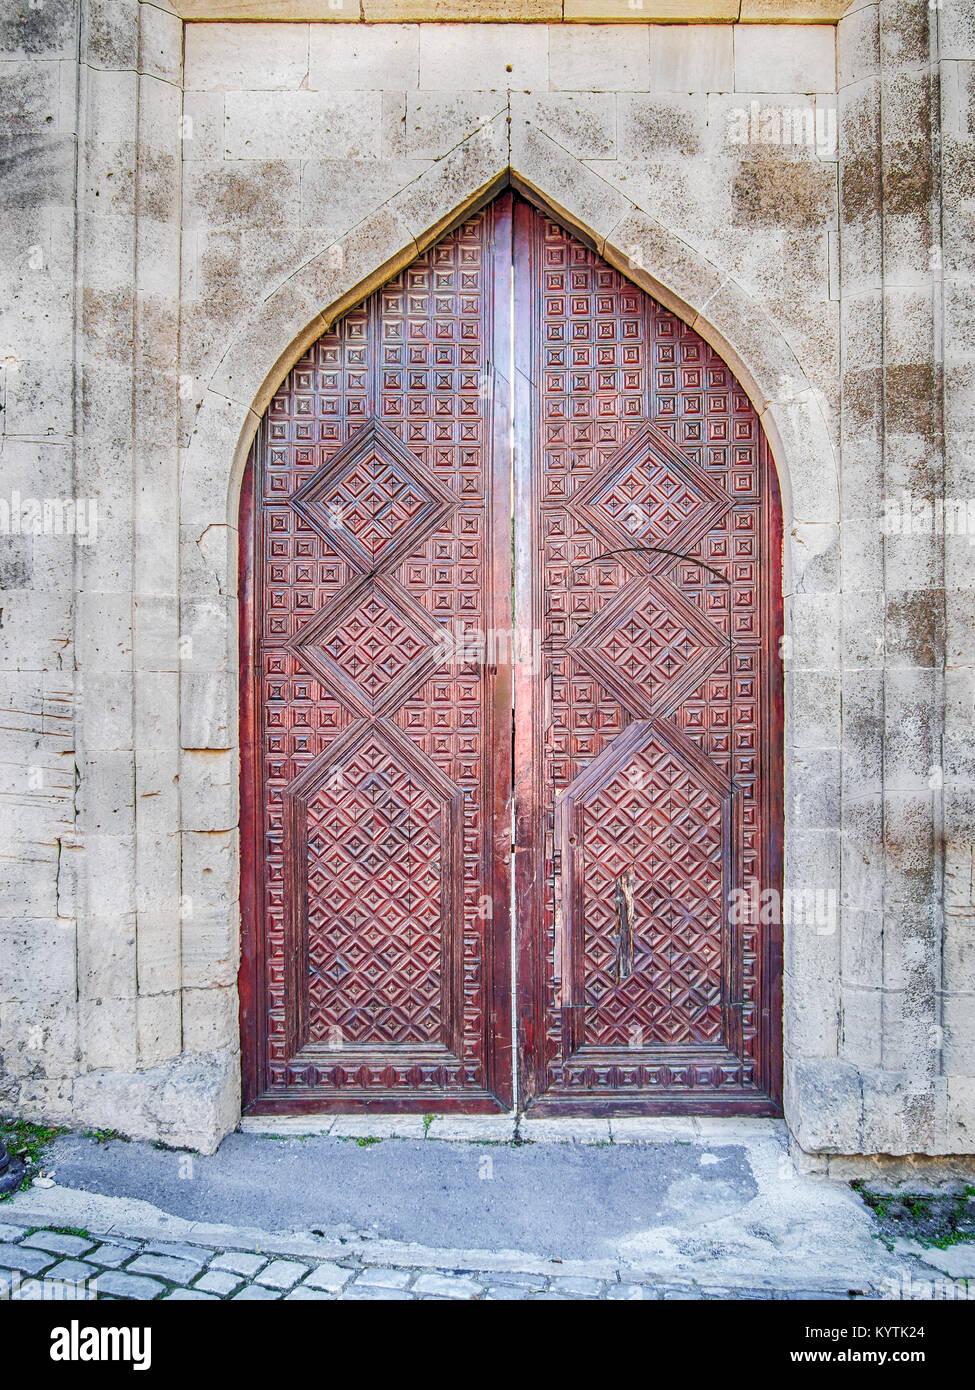 Asian style ancient wooden door in Baku old town - Stock Image